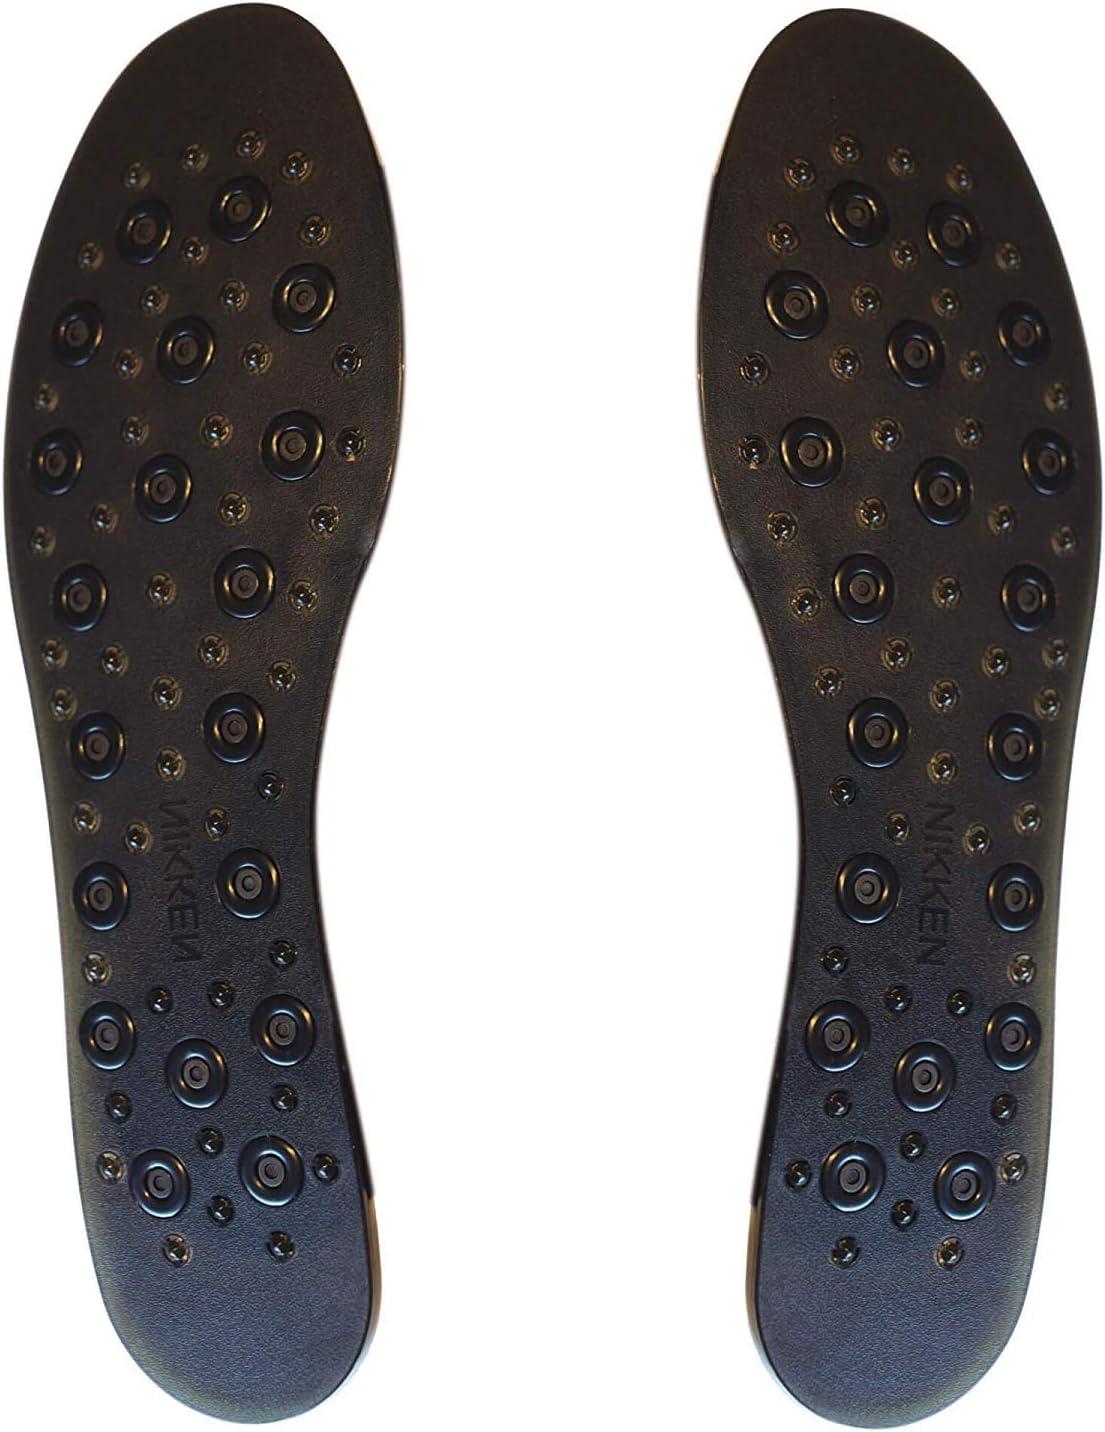 Nikken 1 mSteps Insoles with Acupressure Branded goods Massage 20213 W Be super welcome Nodes